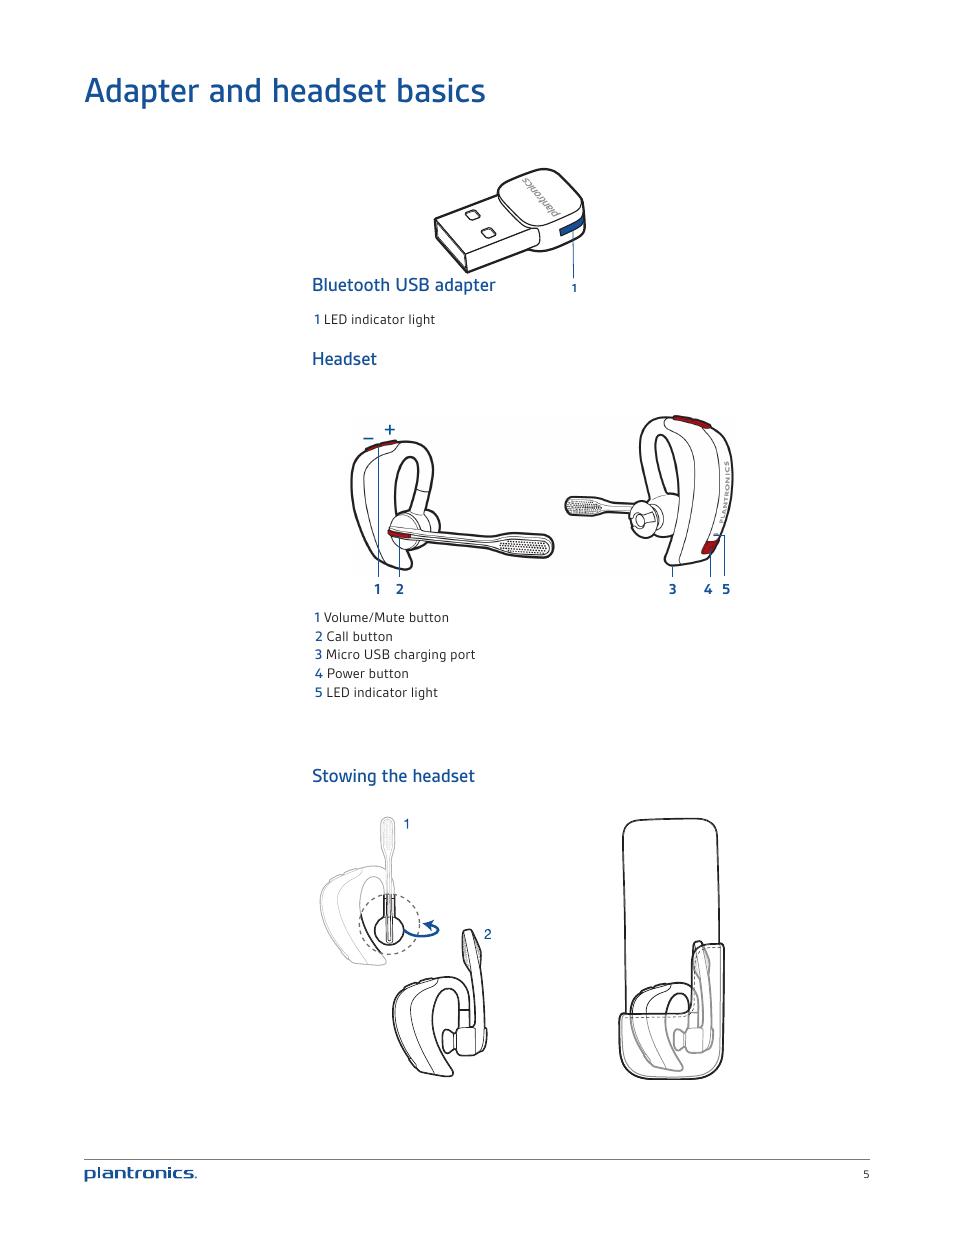 Adapter and headset basics, Bluetooth usb adapter, Headset